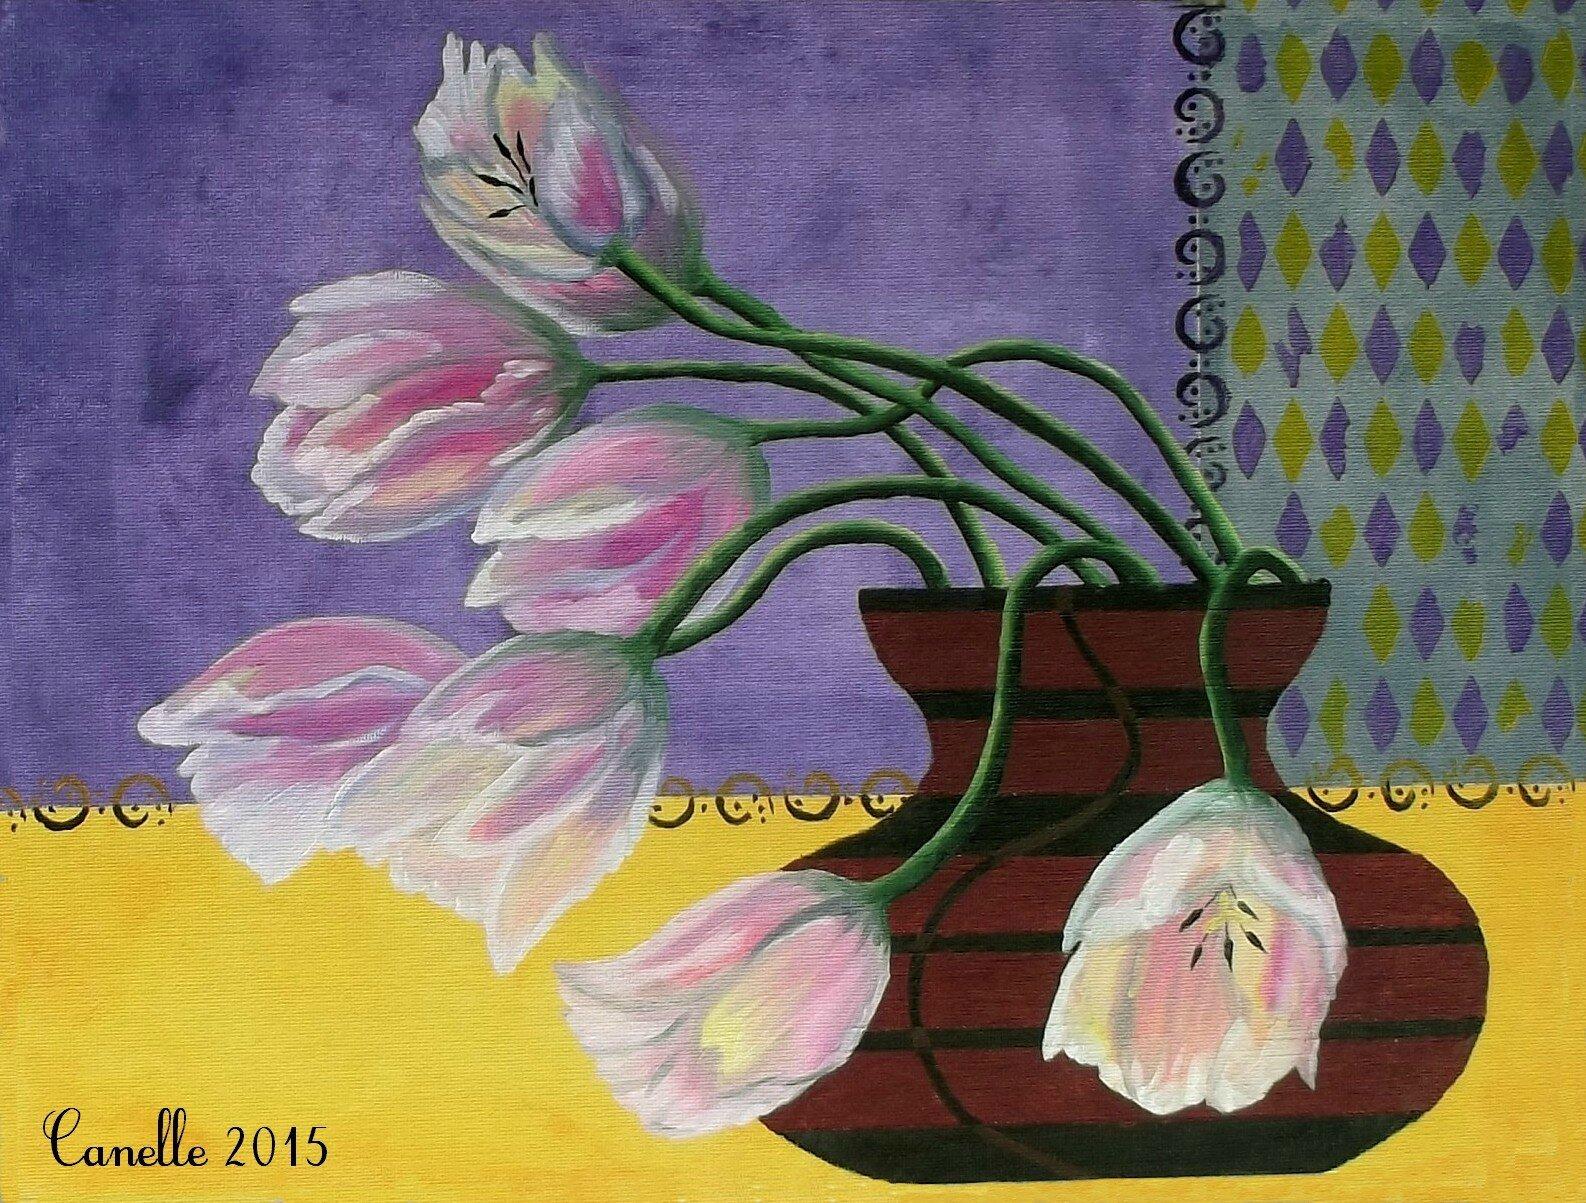 052 - Tulipes au vase taille de guêpe